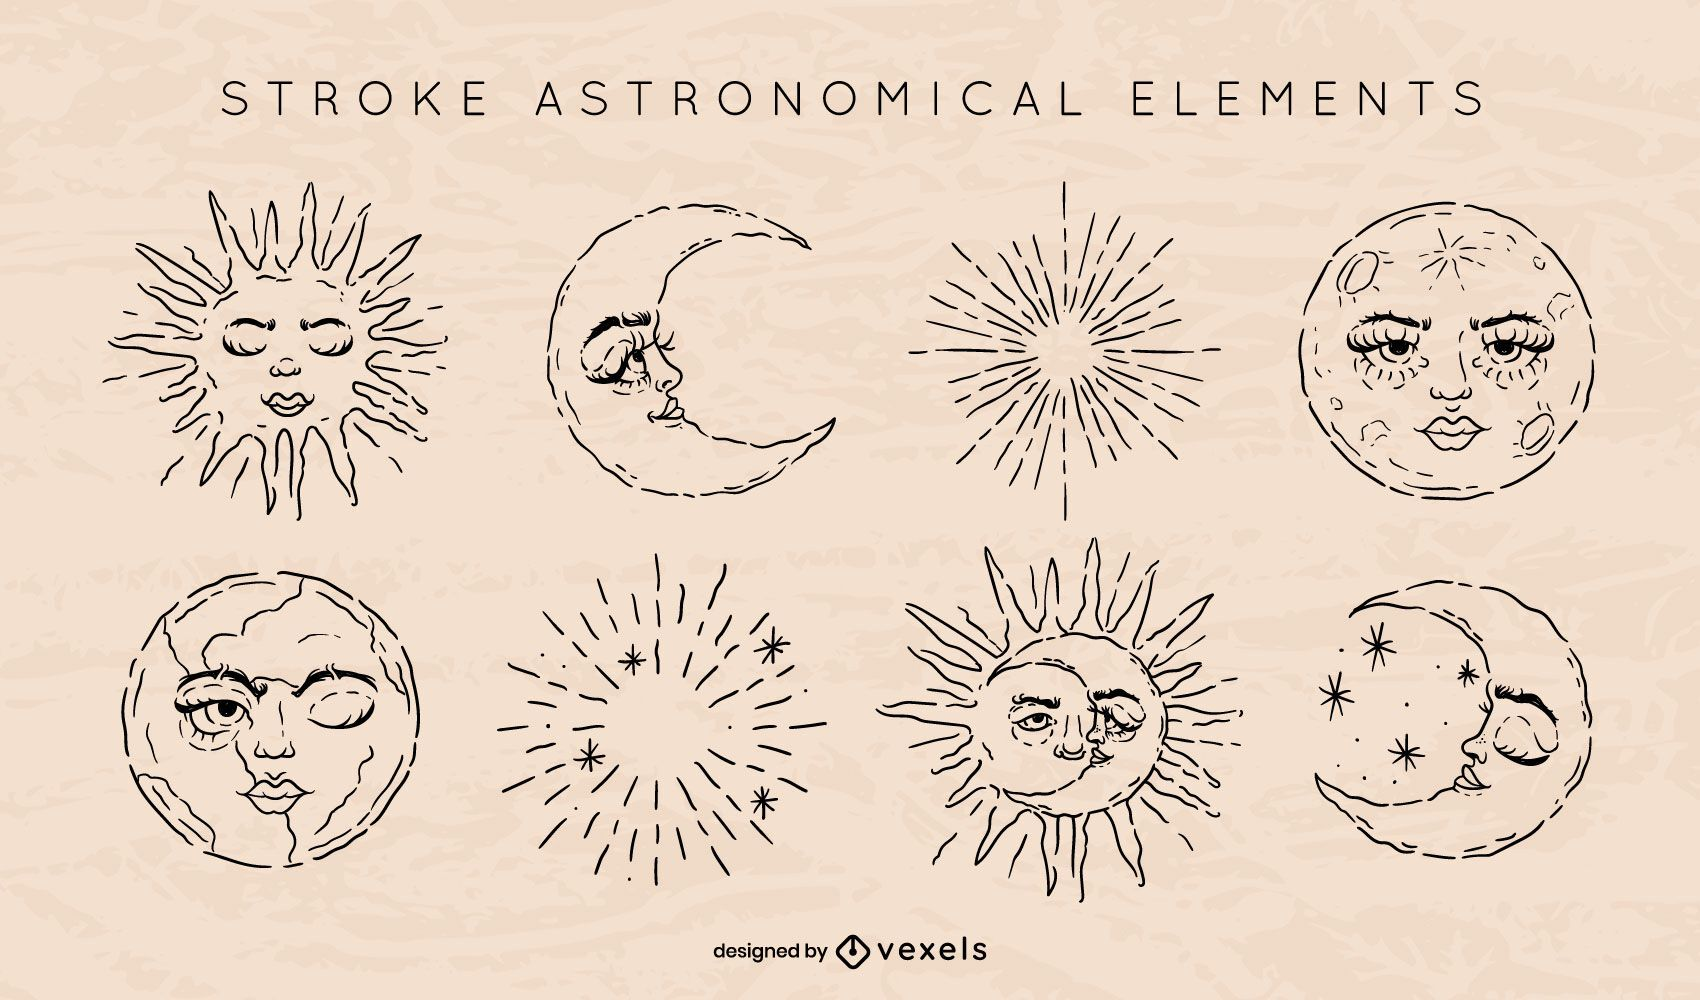 Astronomical element stroke set